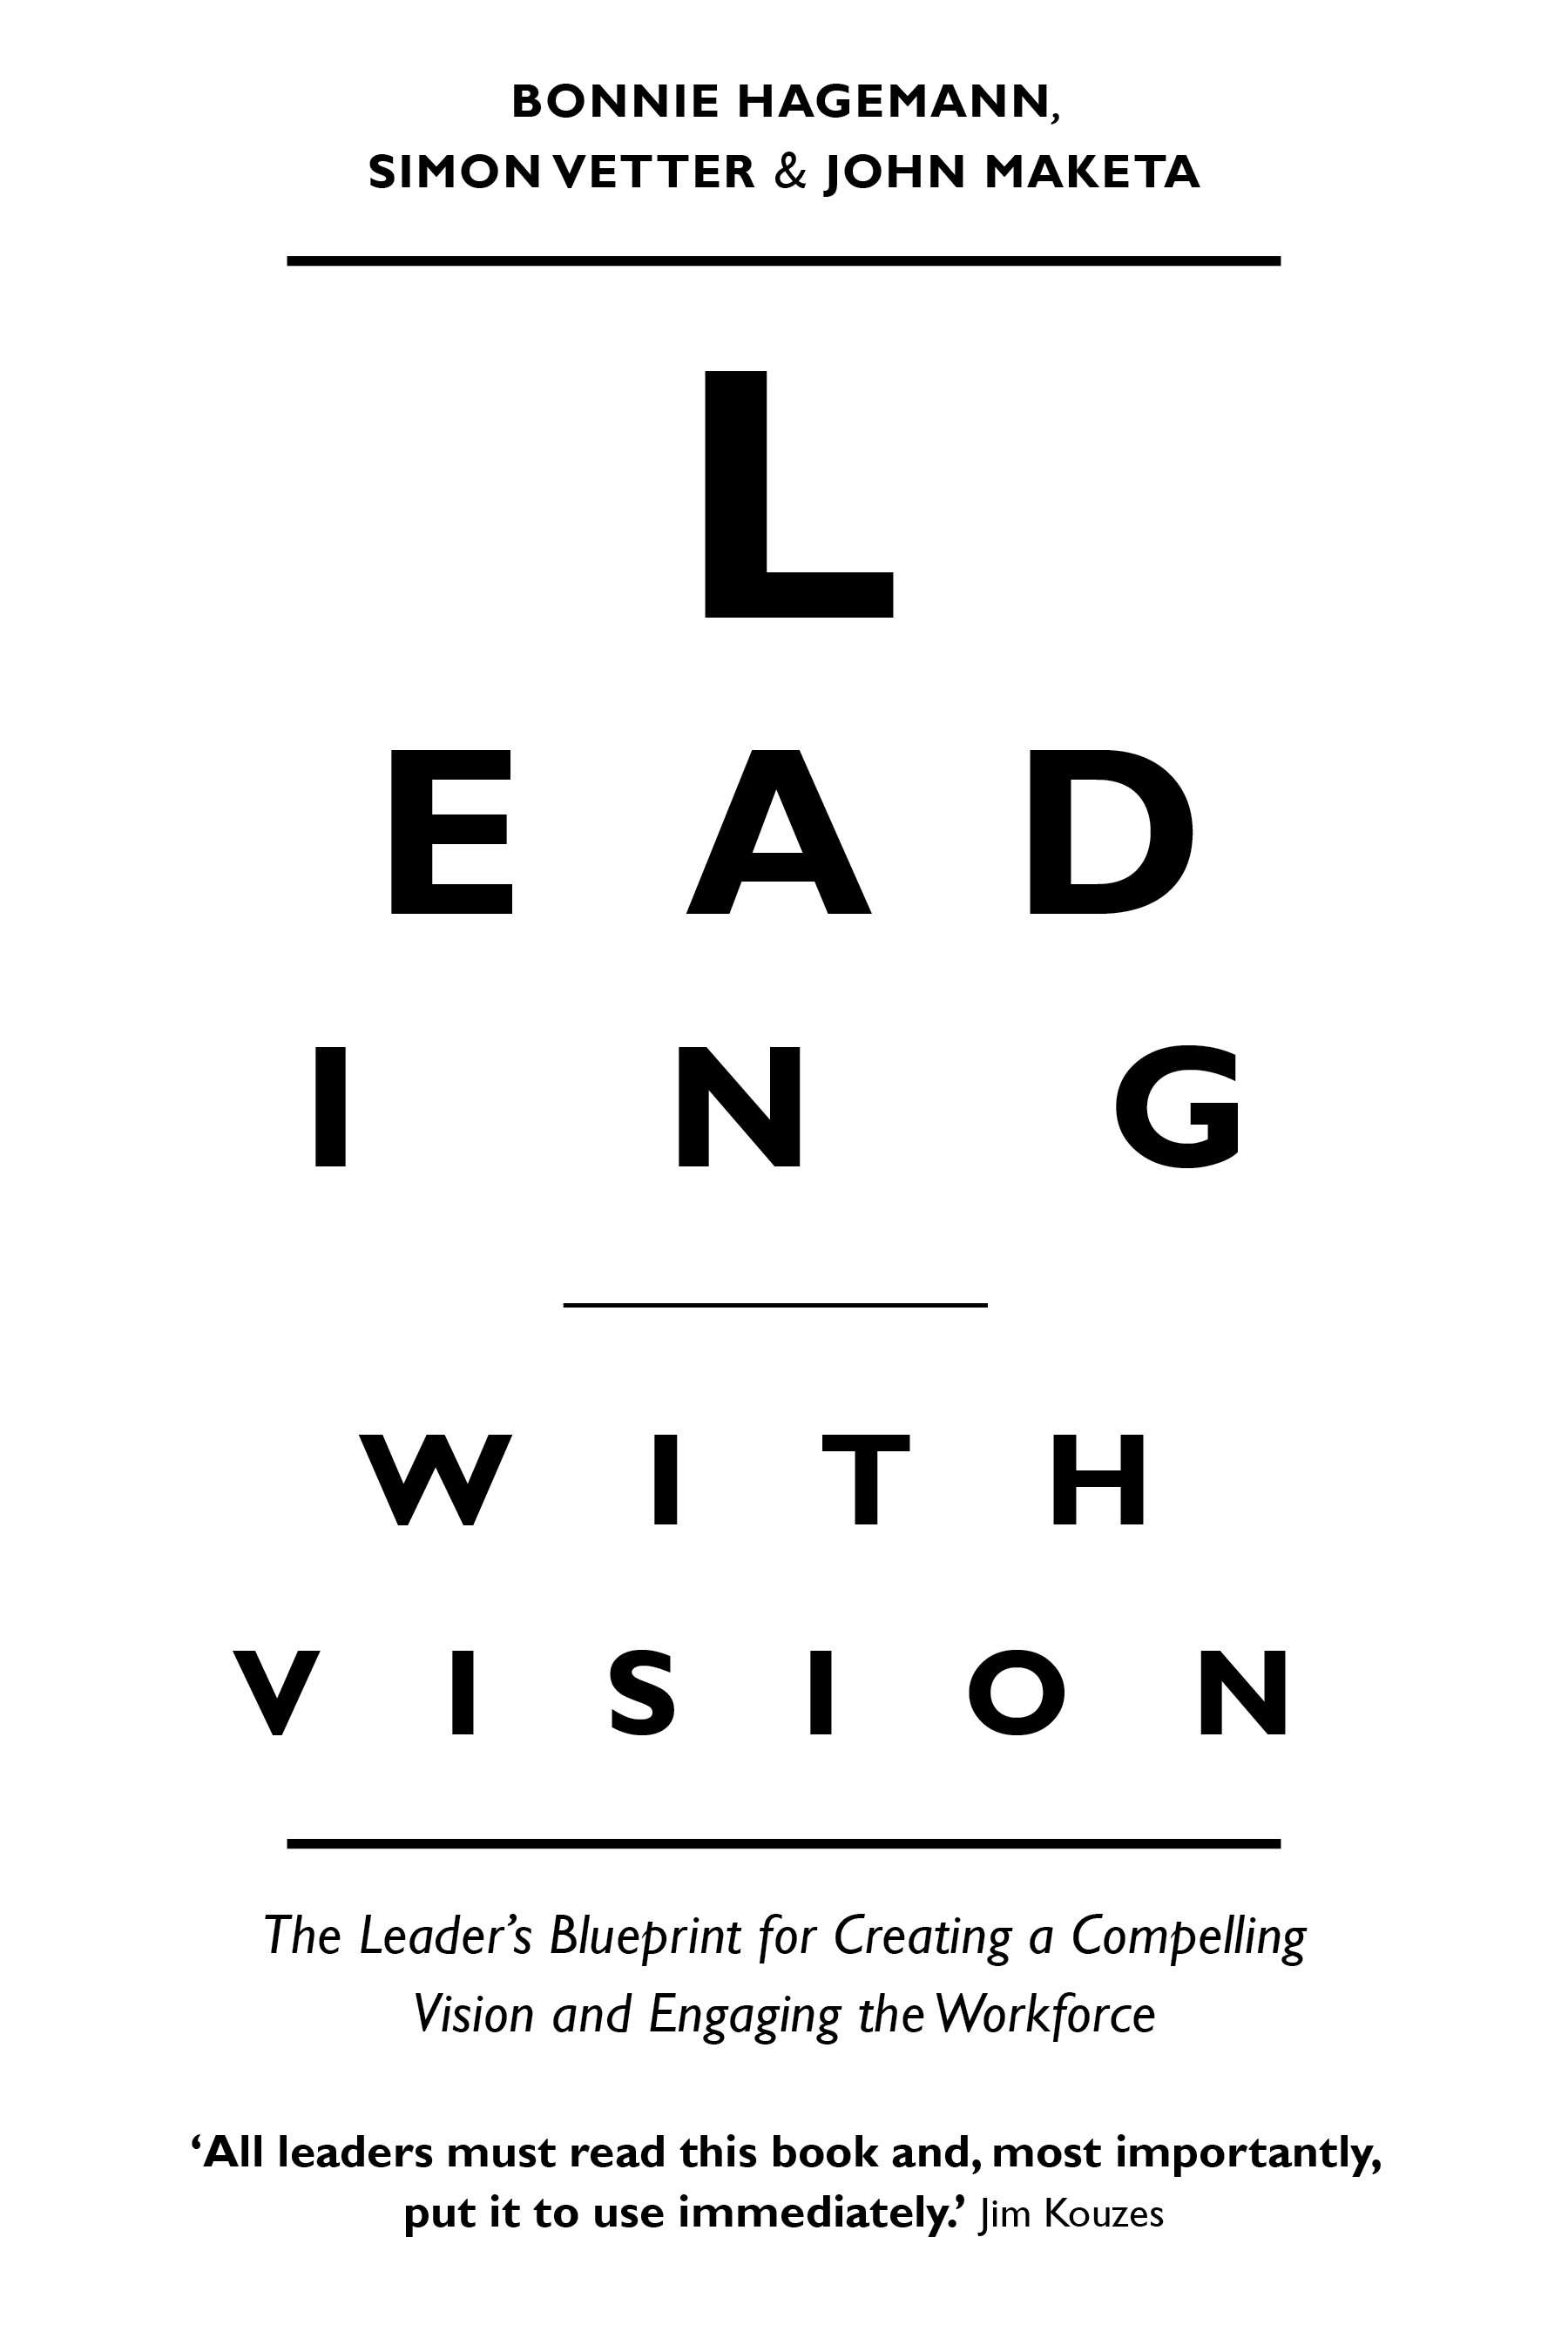 Leading with vision jpg.jpg